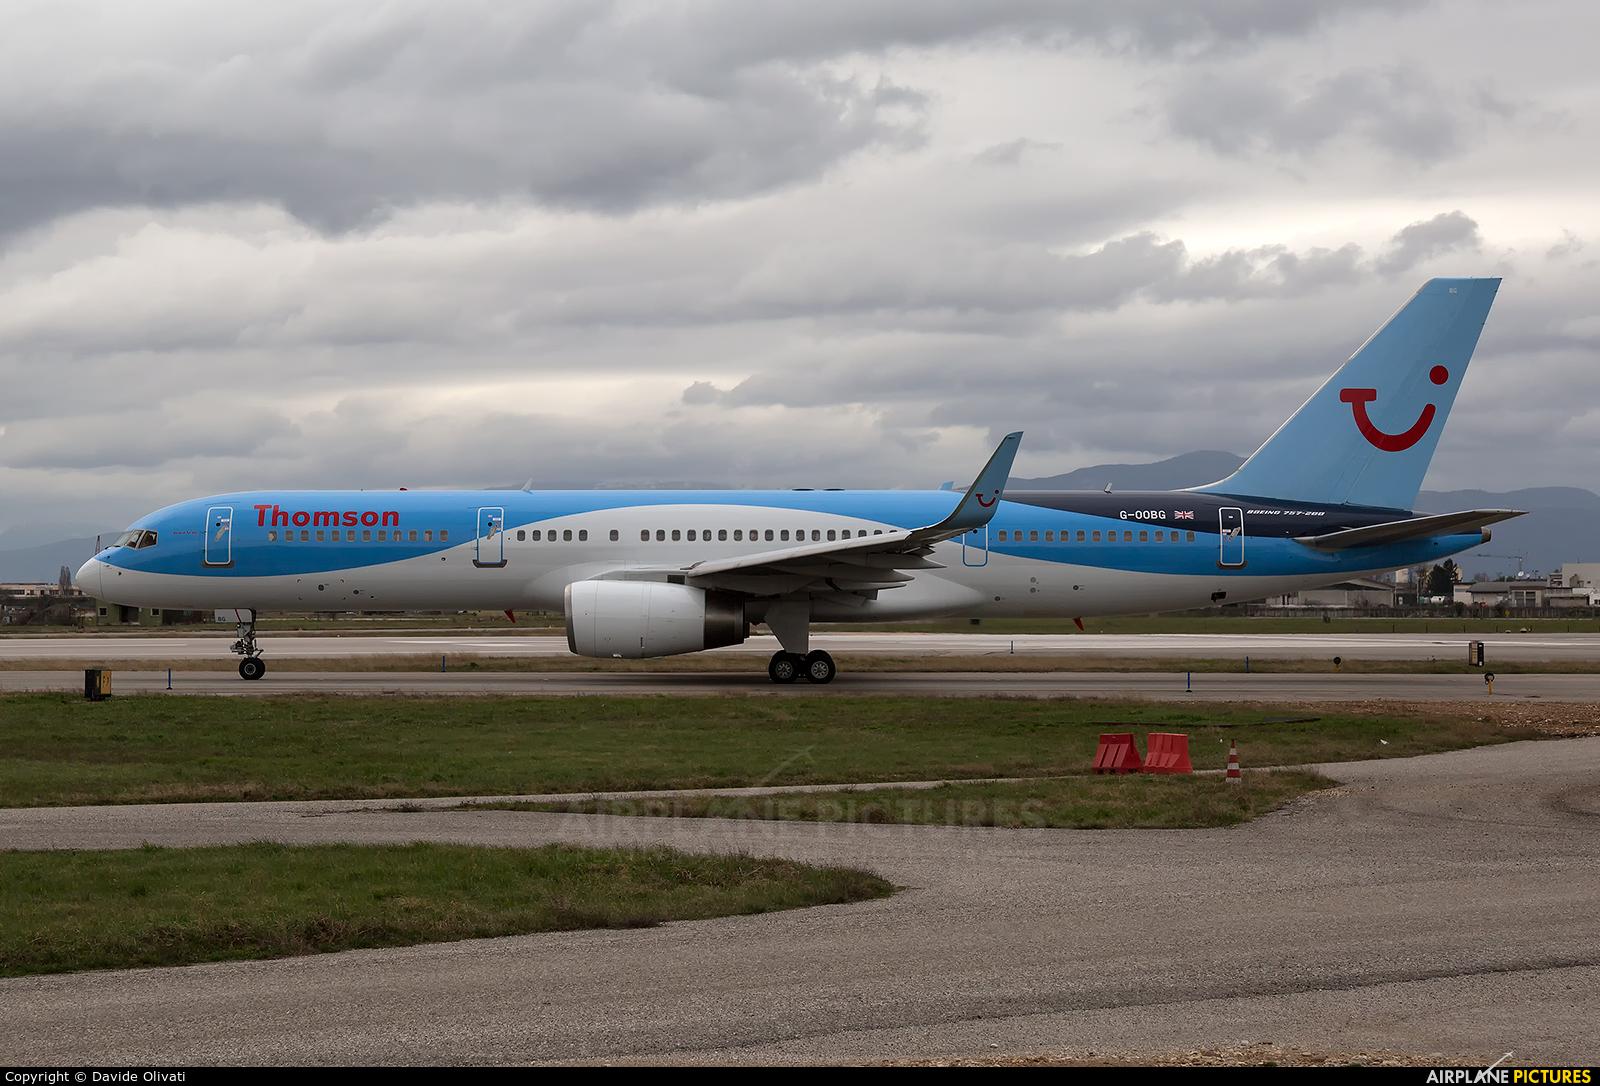 Thomson/Thomsonfly G-OOBG aircraft at Verona - Villafranca